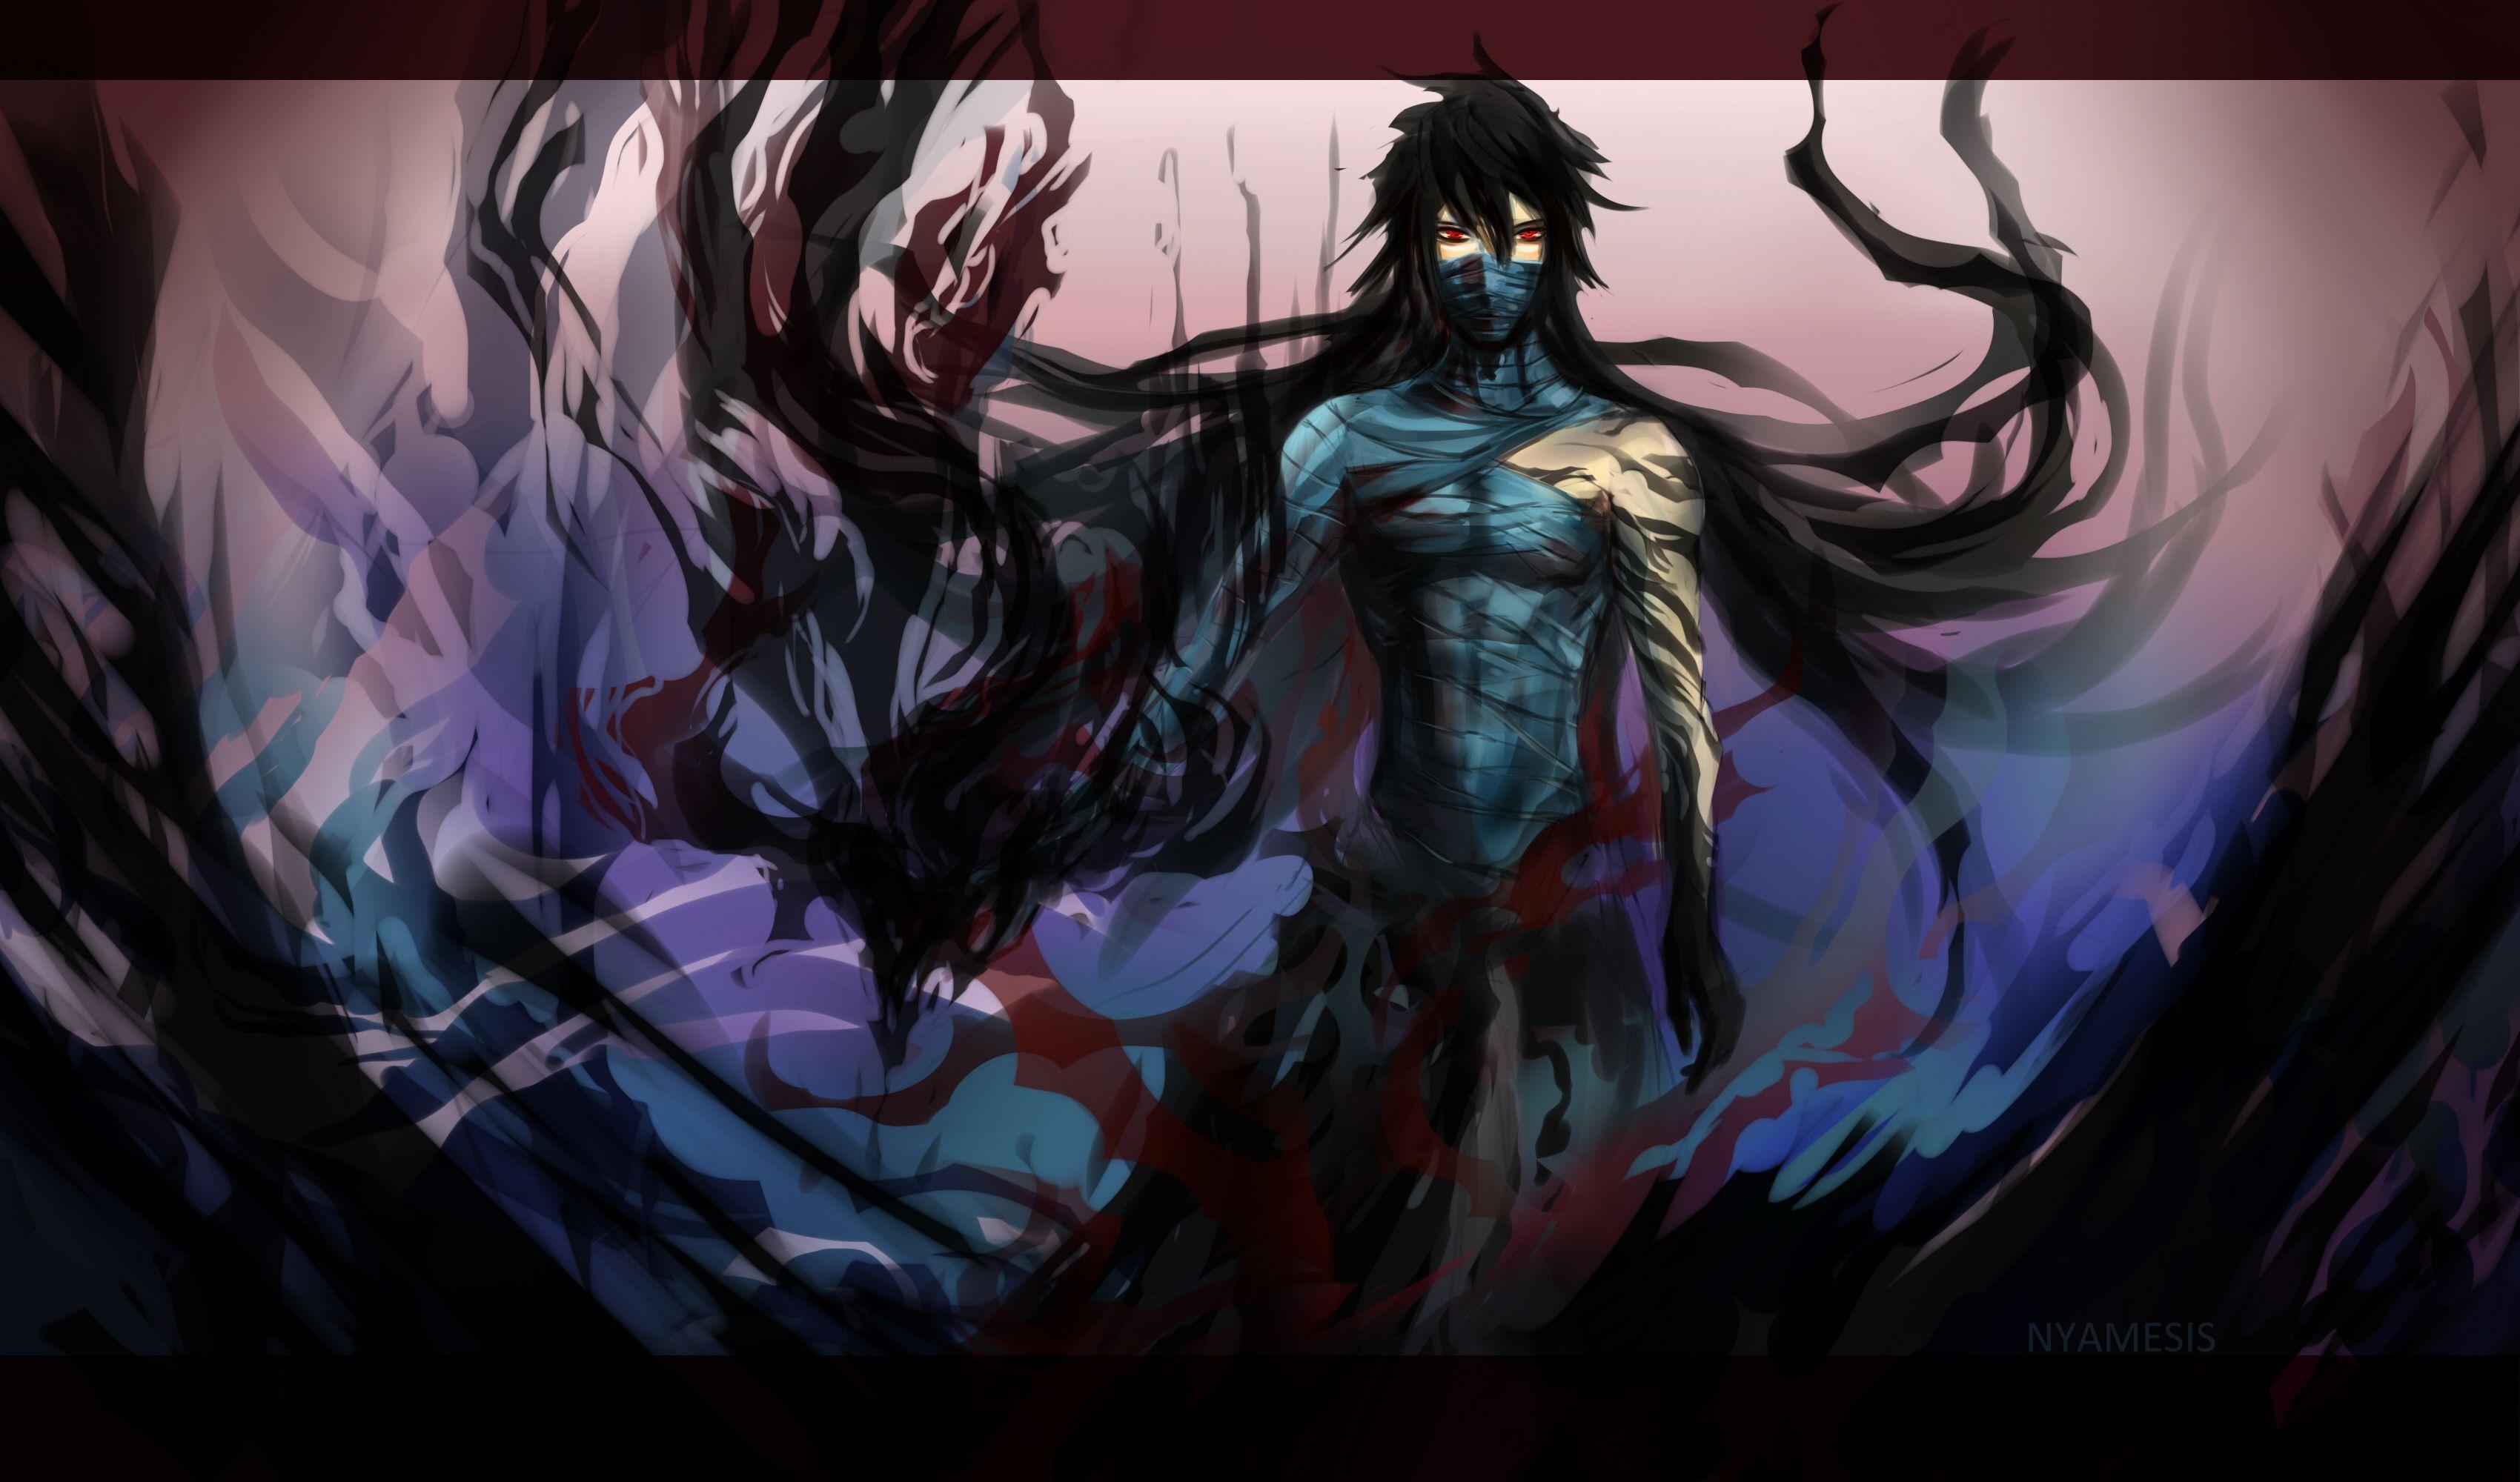 Mugetsu Kurosaki Ichigo 1471059 Anime Bleach Guerrera Anime Fondo De Anime